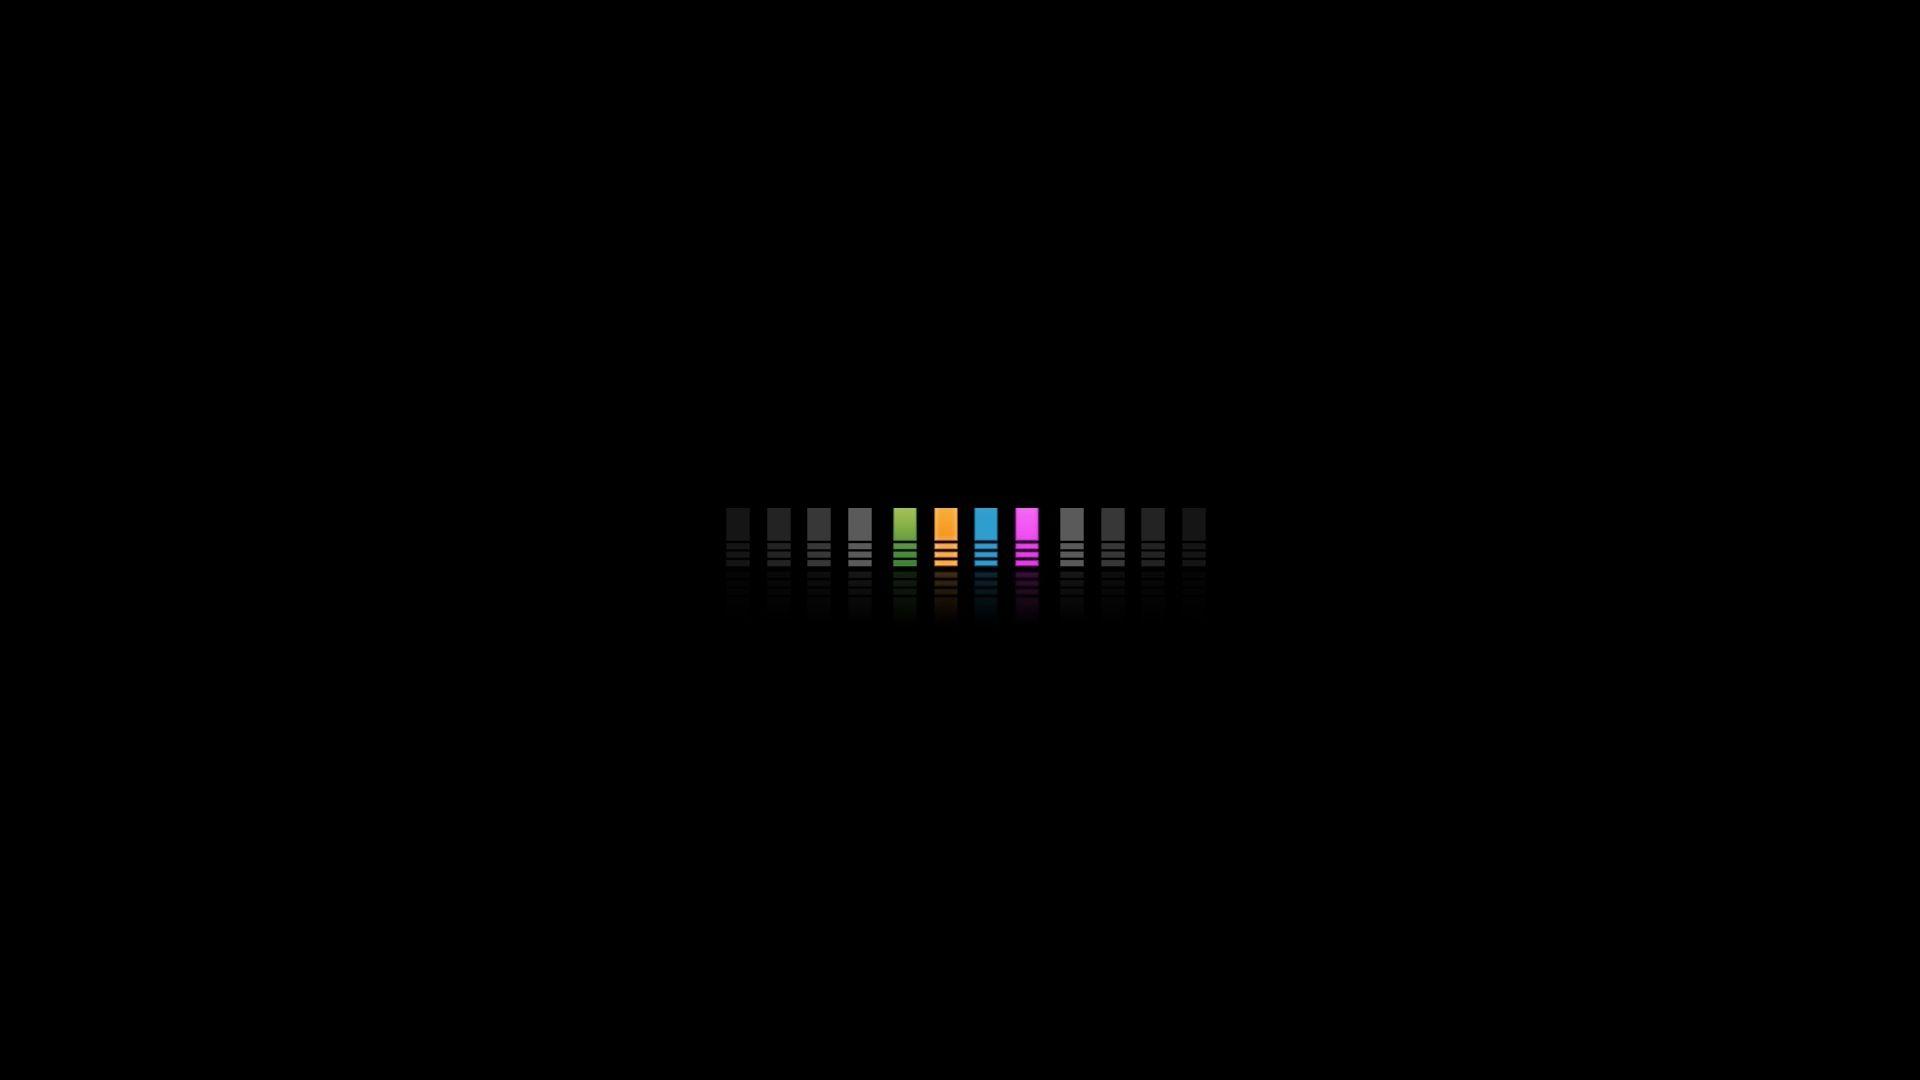 black desktop wallpaper hd